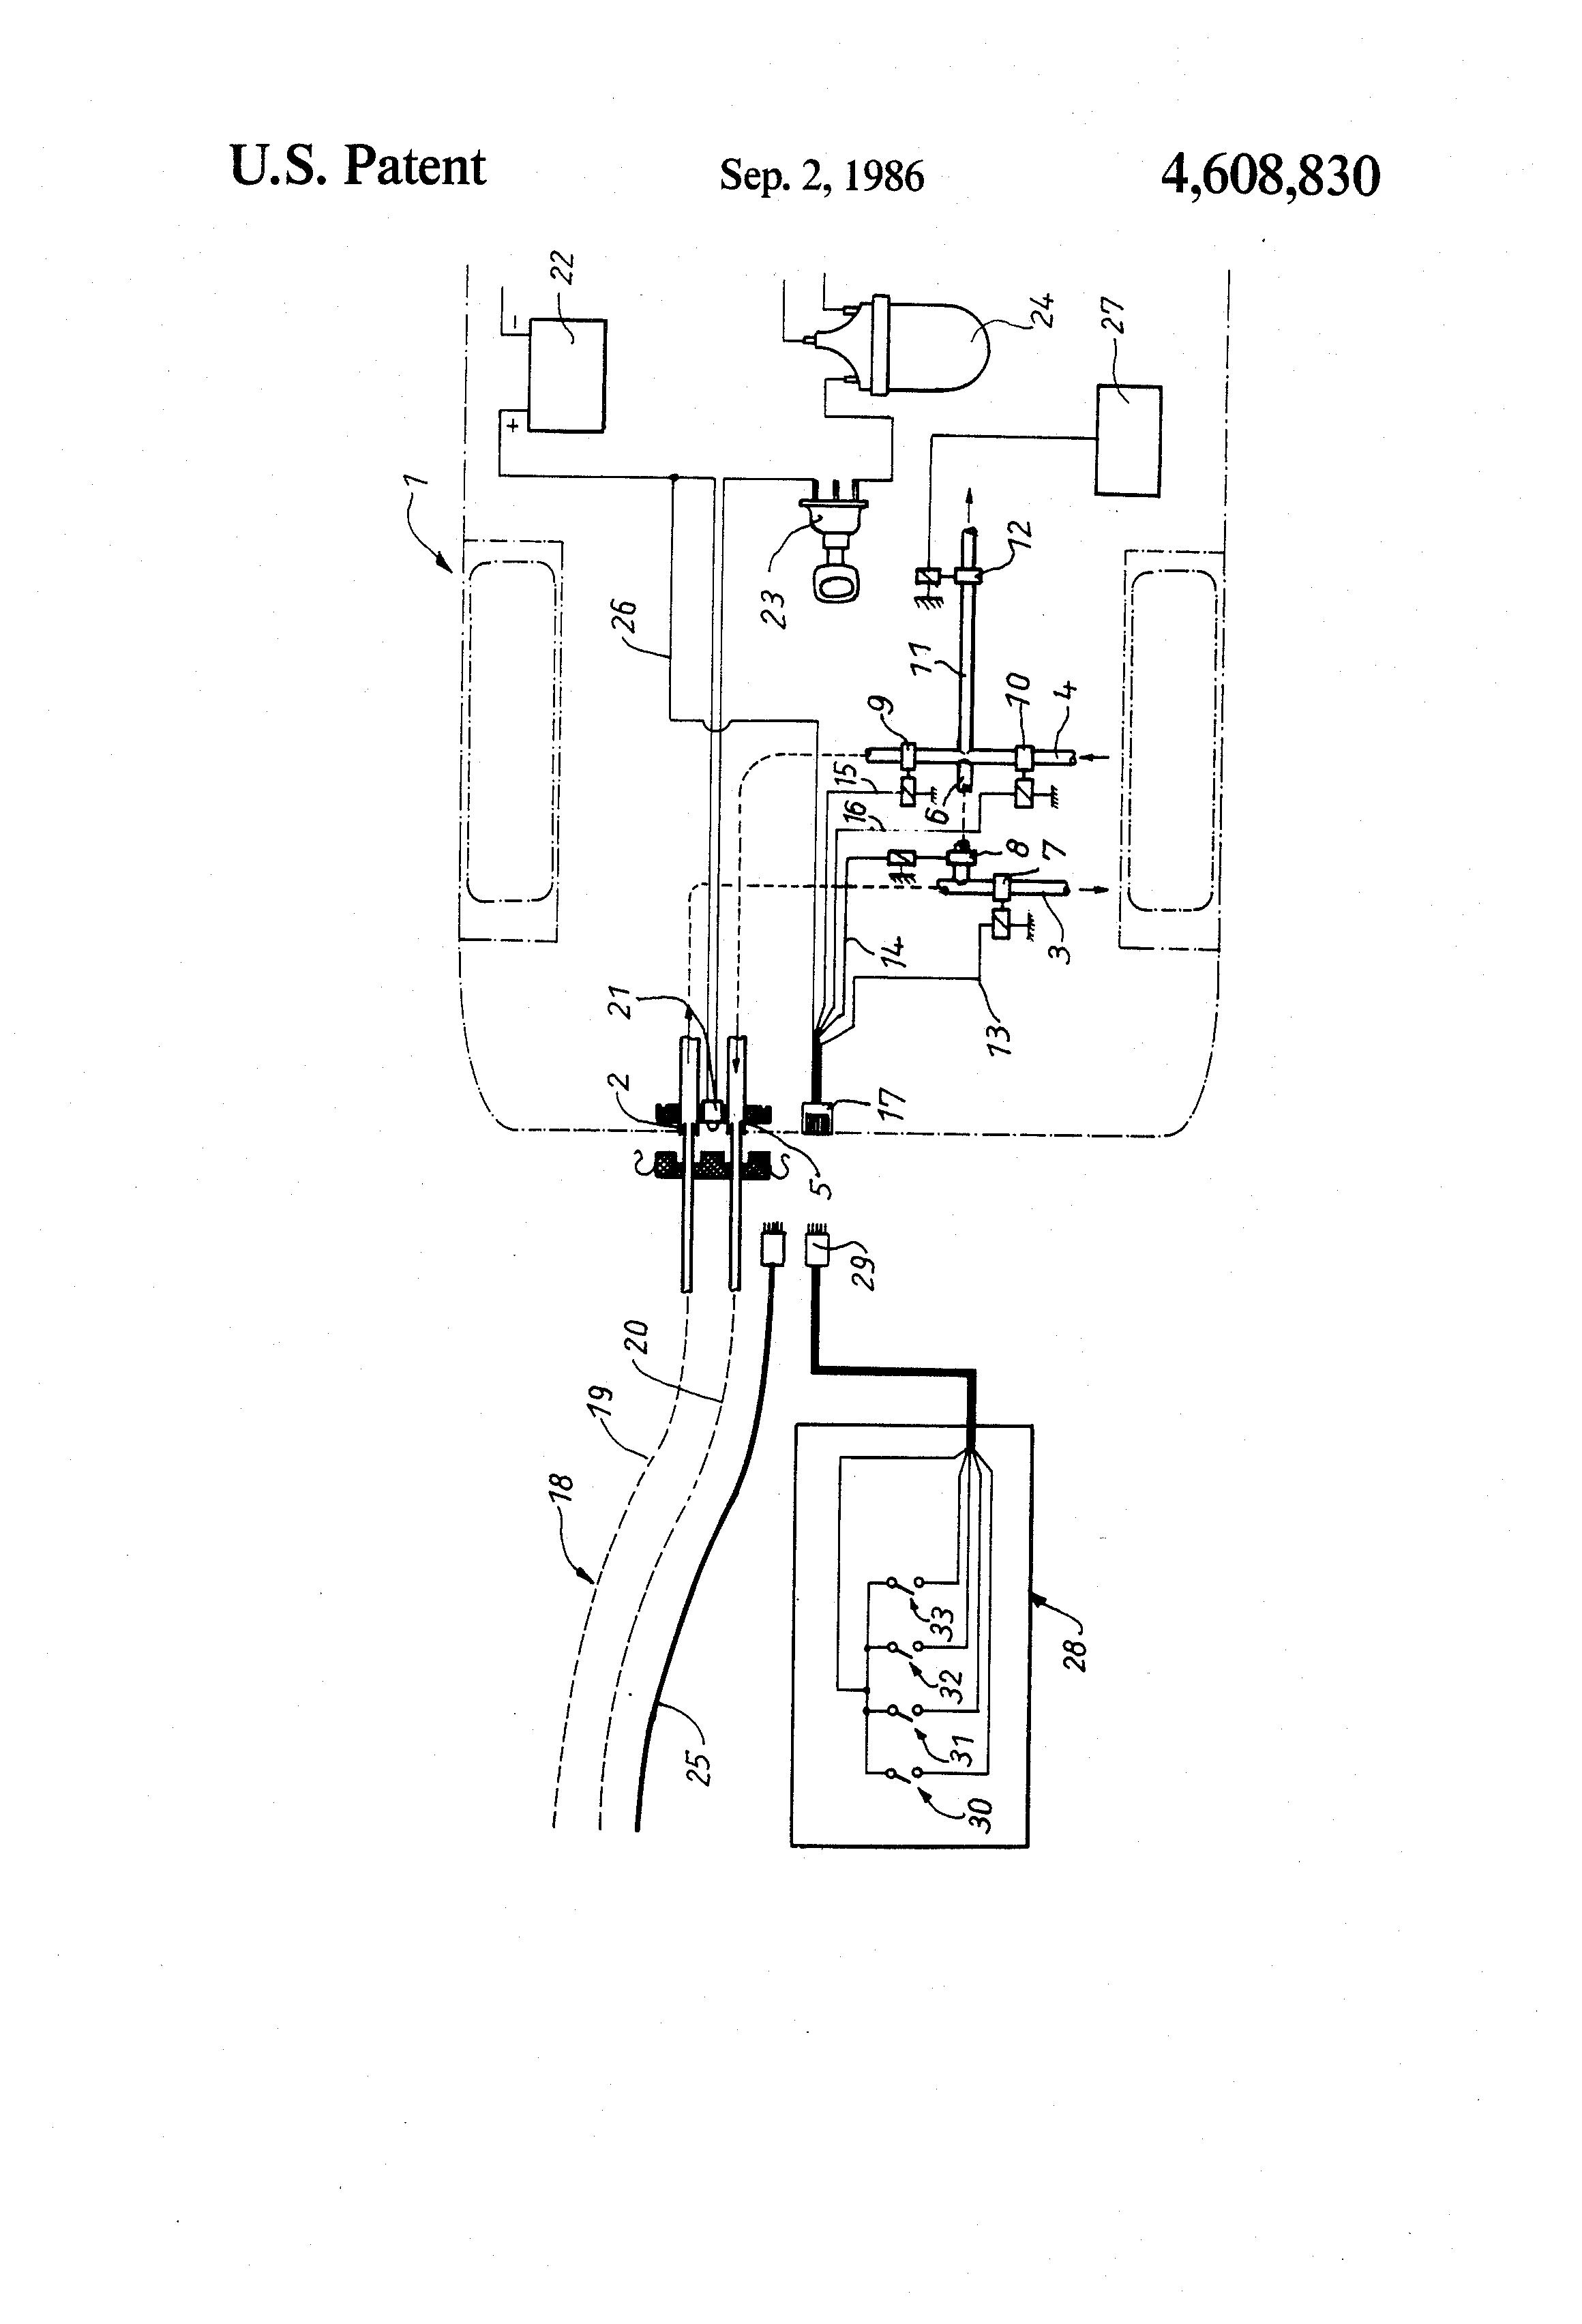 1967 Camaro Headlight Wiring Diagram As Well Chevy One Wire Alternator